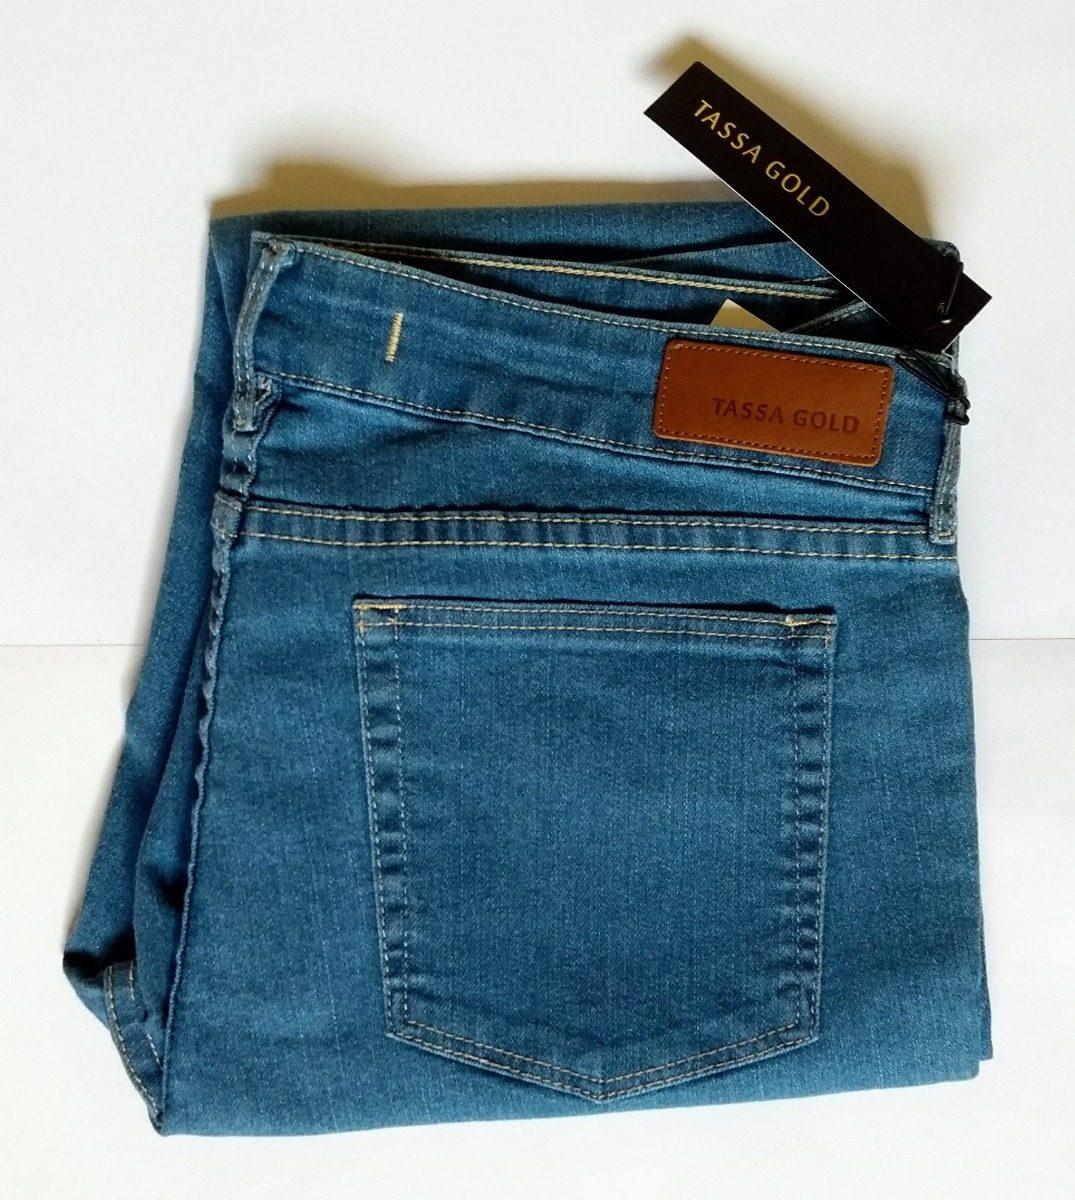 45b400bcc calça jeans feminina, tassa gold, stretch skinny, delavê, 46. Carregando  zoom.